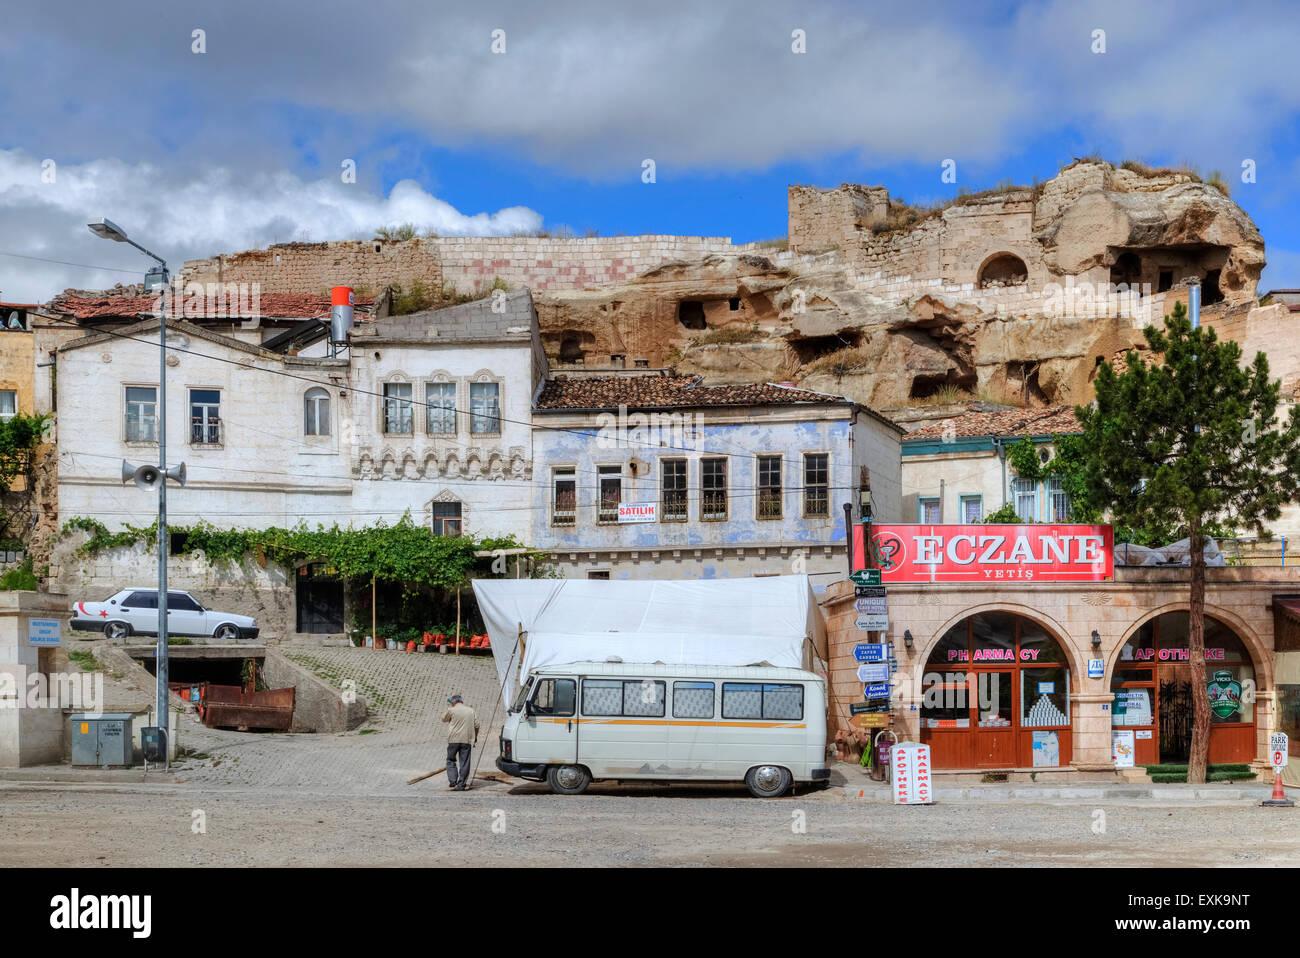 Mustafapasa, Urgup, Cappadocia, Anatolia, Turkey - Stock Image